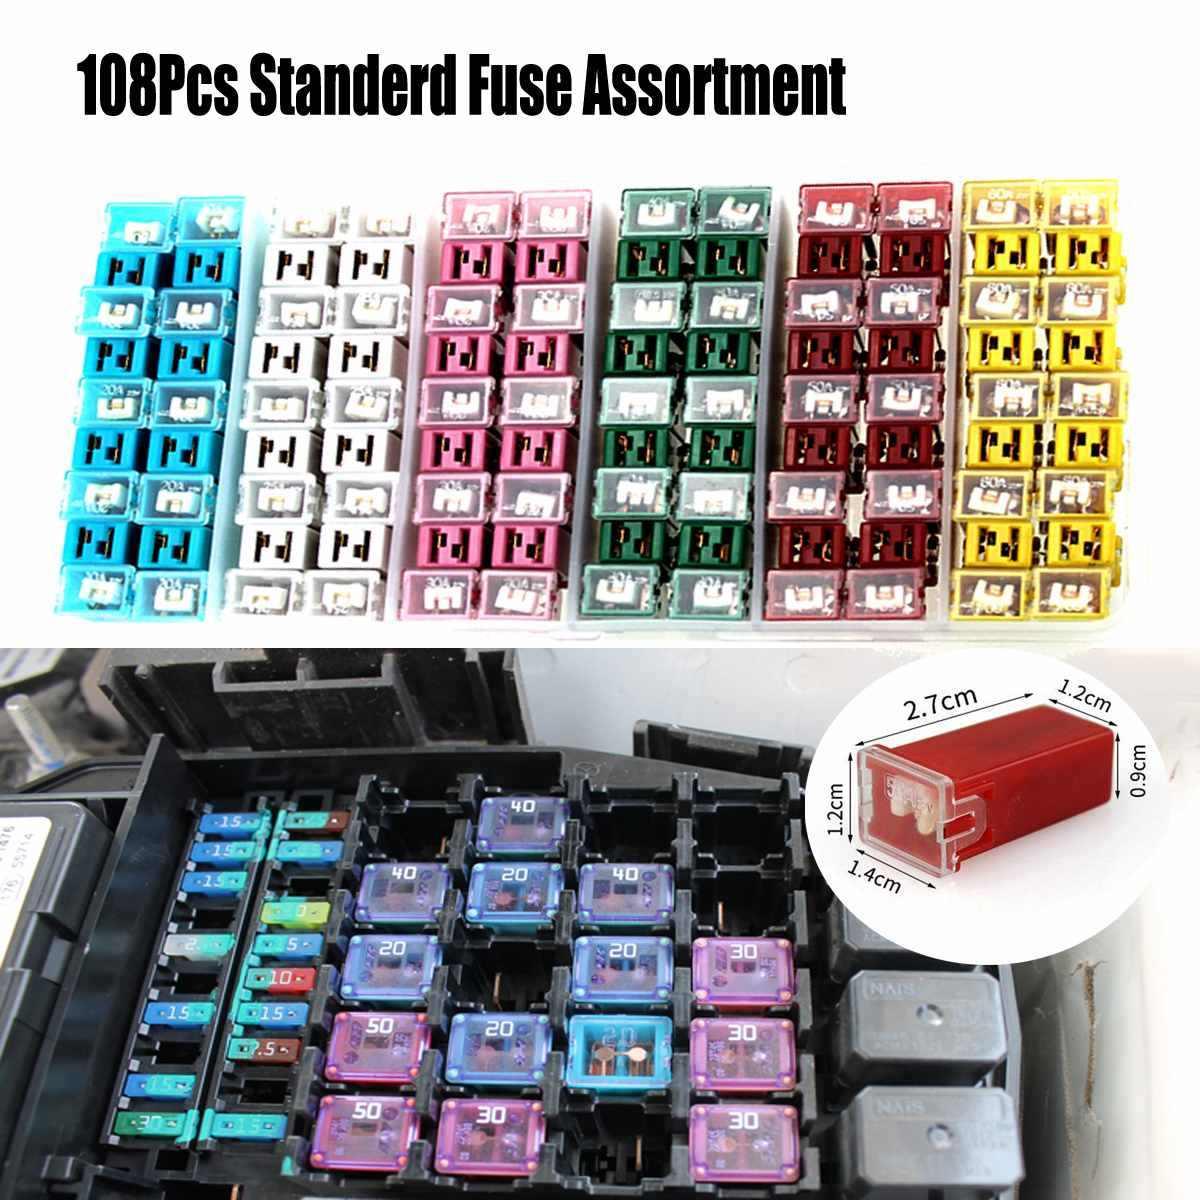 9/12/24/30/60/108pcs Car Fuse Box Automotive Japanese Auto Fuse Box Kit PAL  LOW PROFILE JCASE Box Shaped Fuse Kit for Toyota| | - AliExpresswww.aliexpress.com